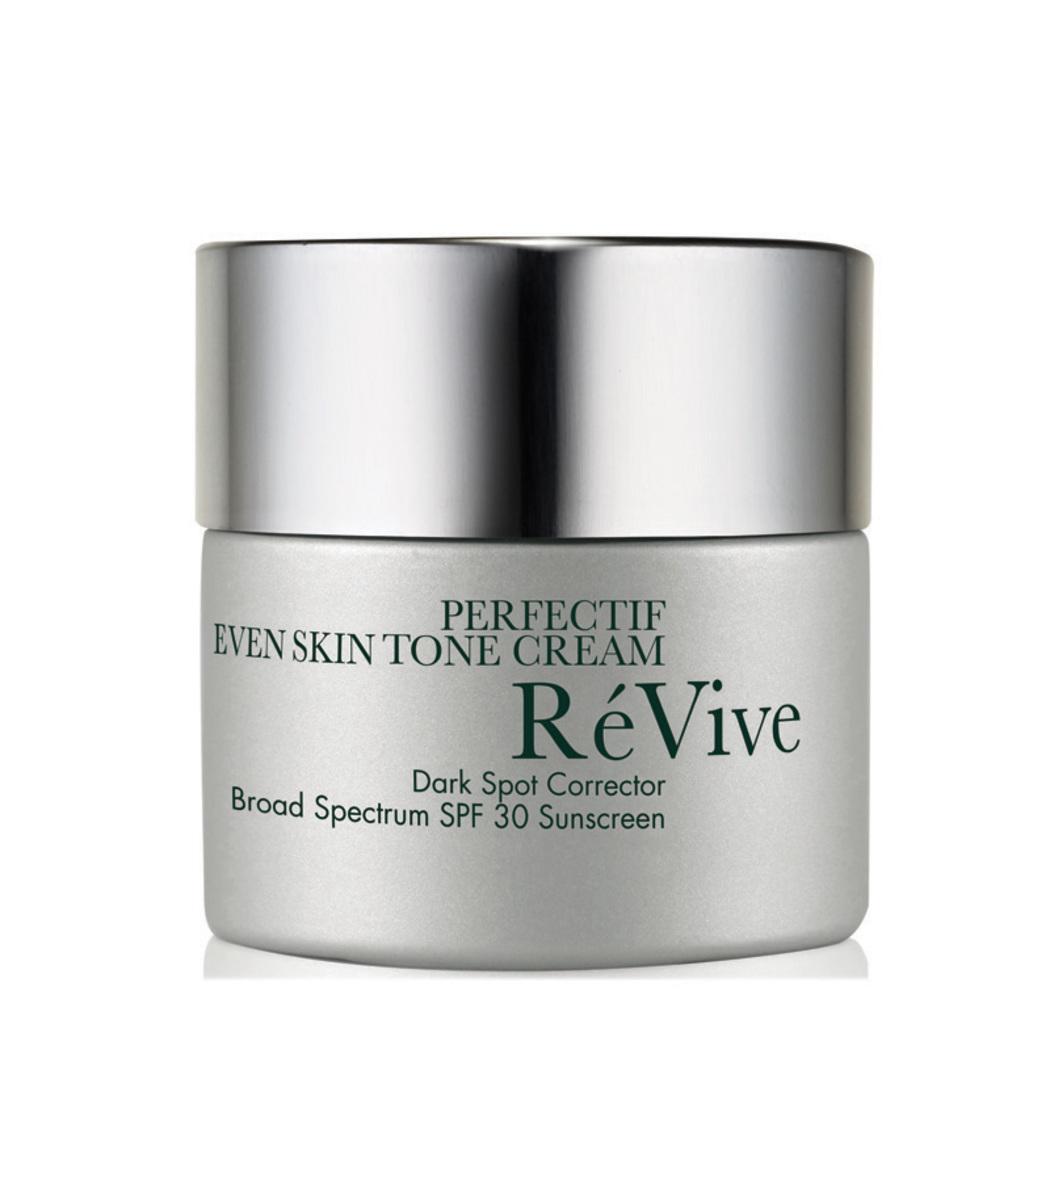 REVIVE Perfectif Even Skin Tone Cream